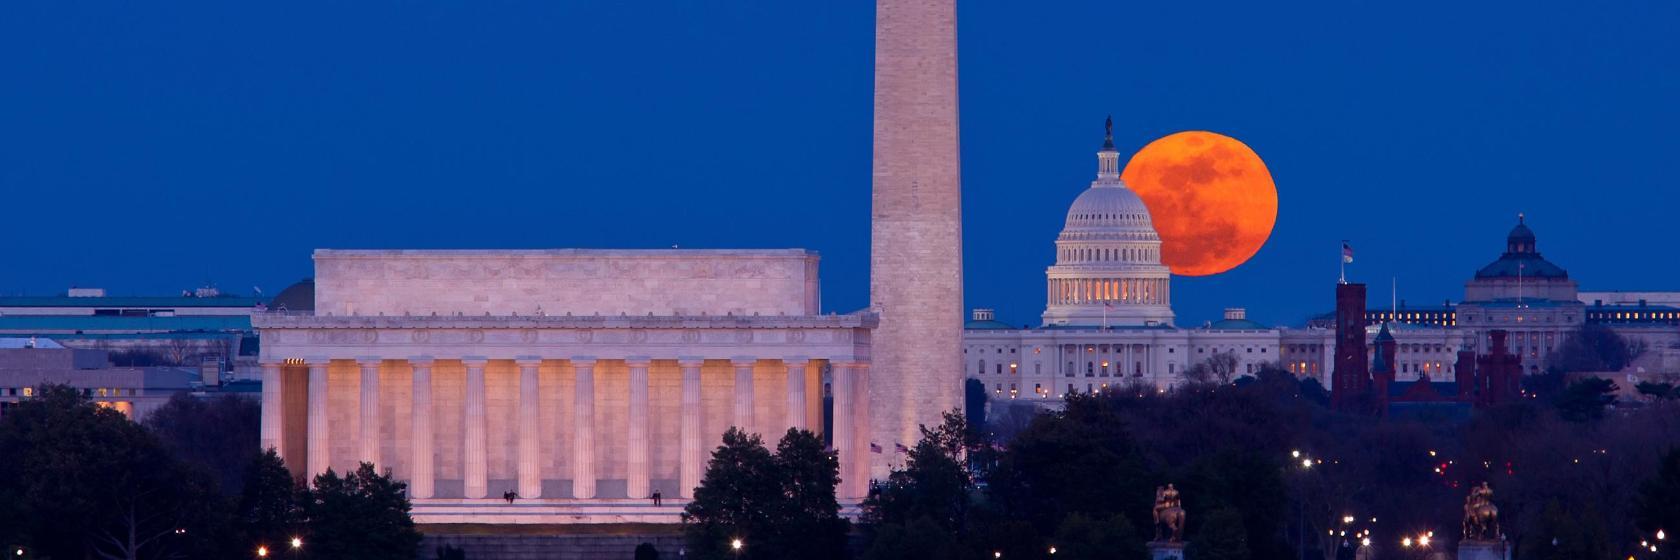 Washington, DC, USA Hotels